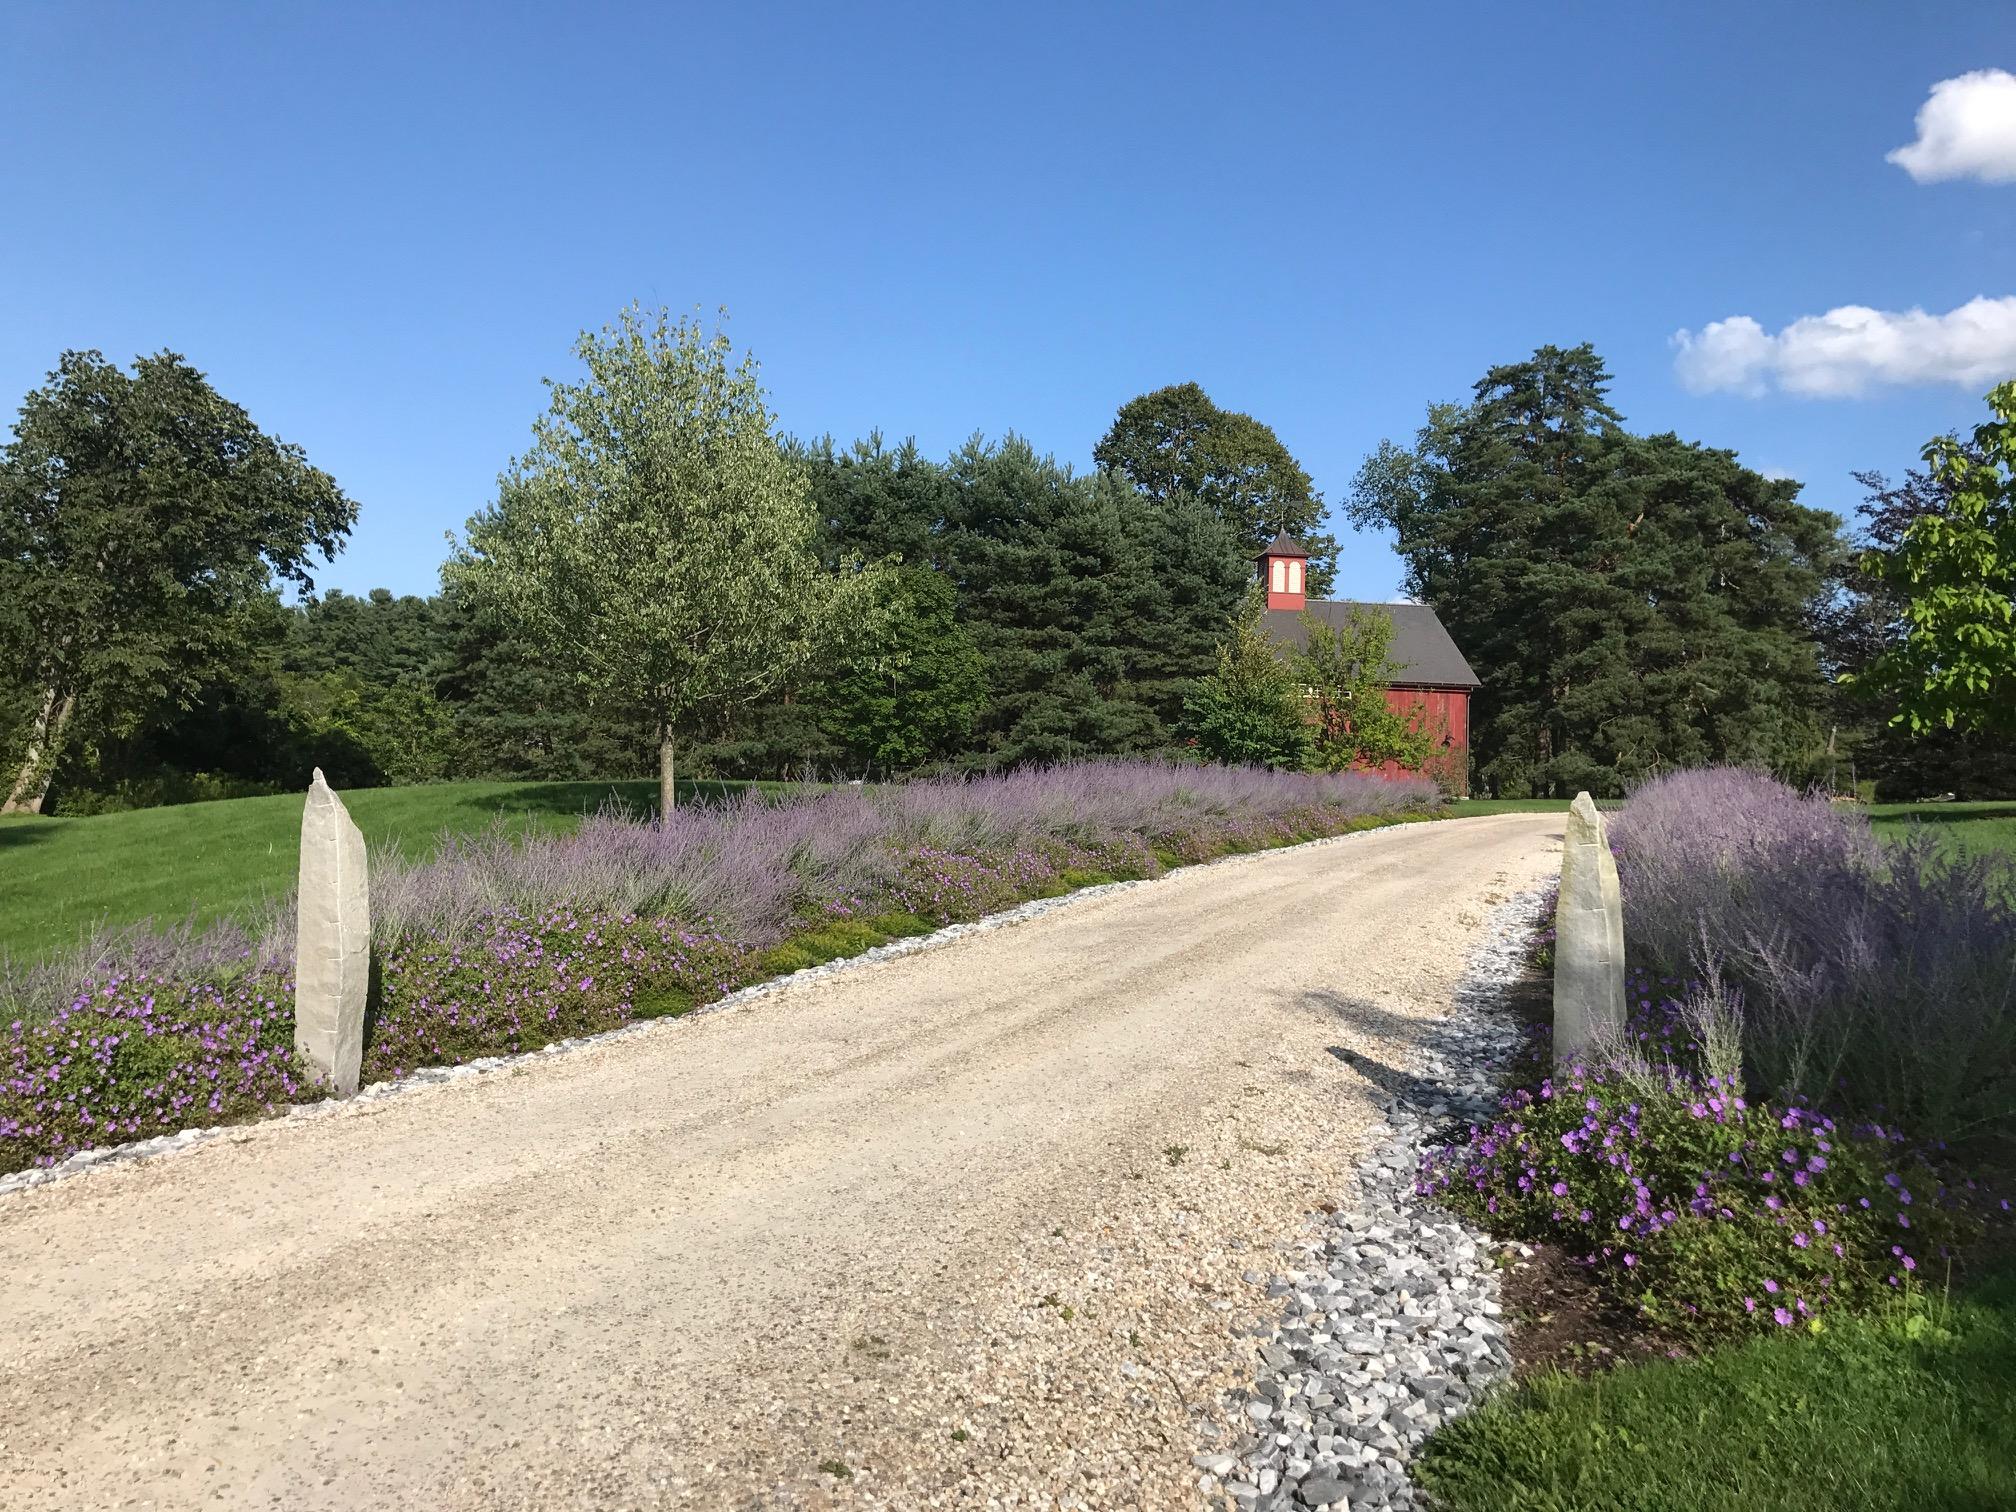 LB Farm front entry at road